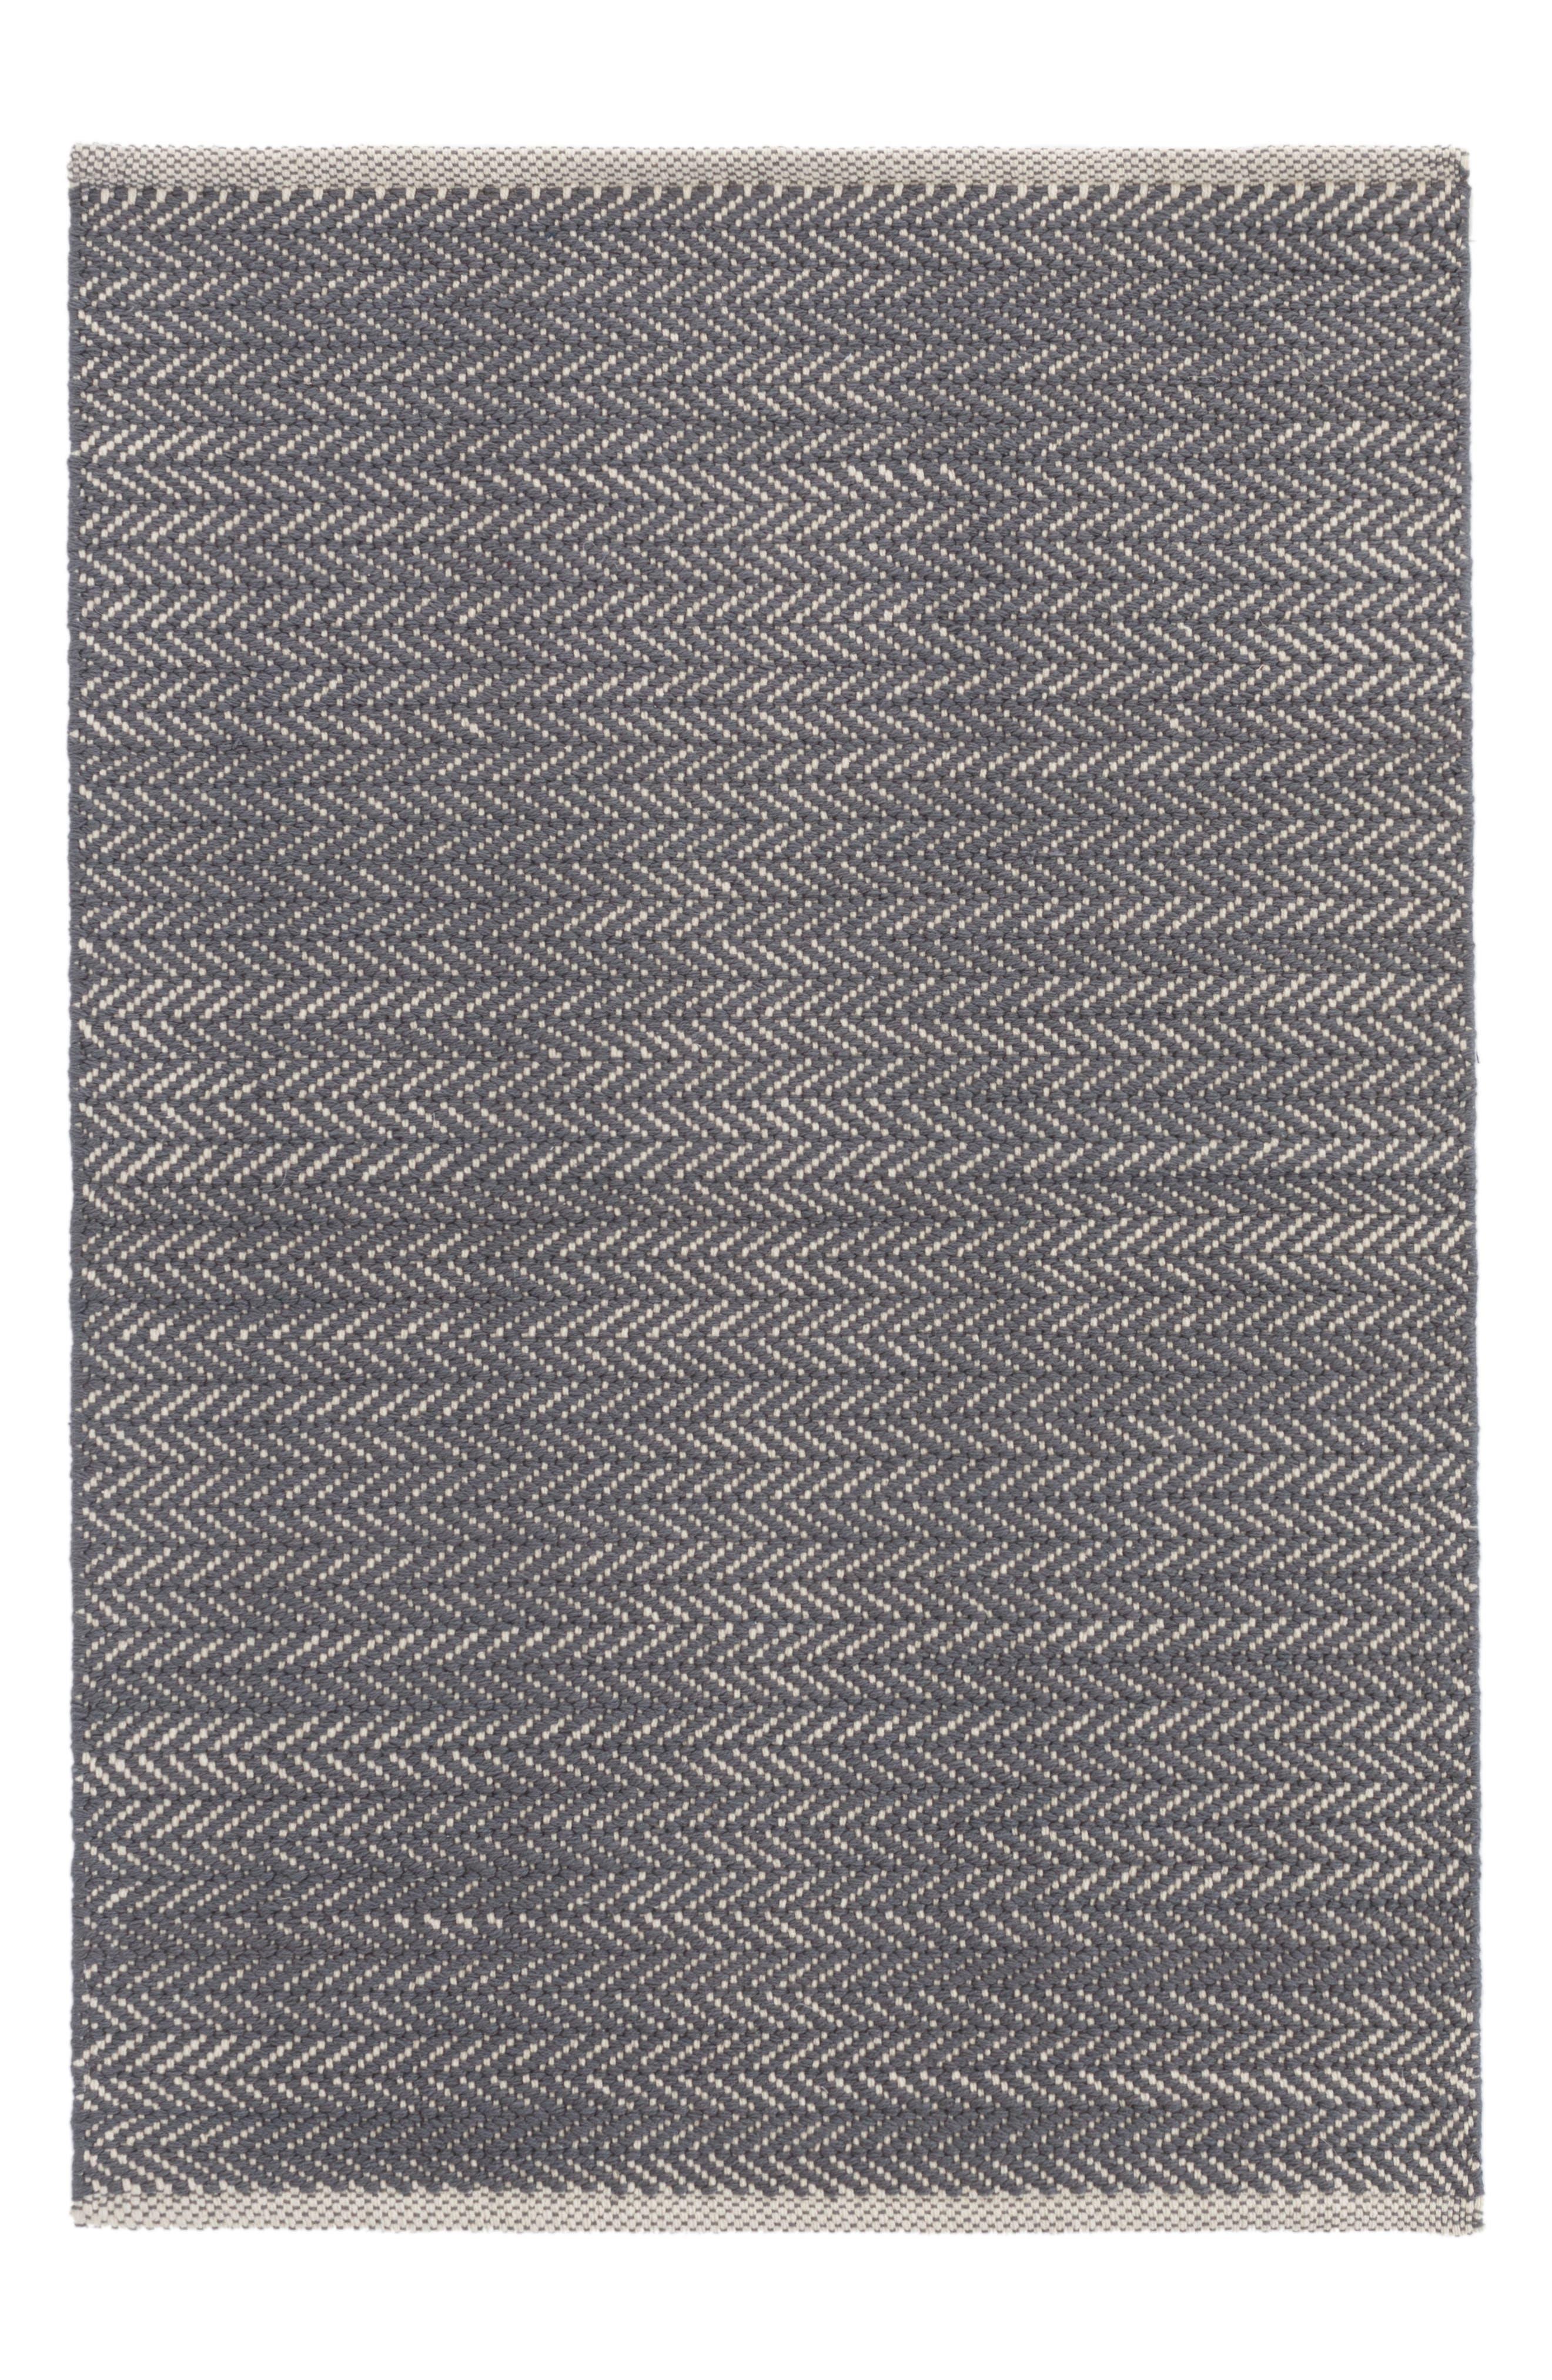 Herringbone Rug,                             Main thumbnail 1, color,                             BLUE